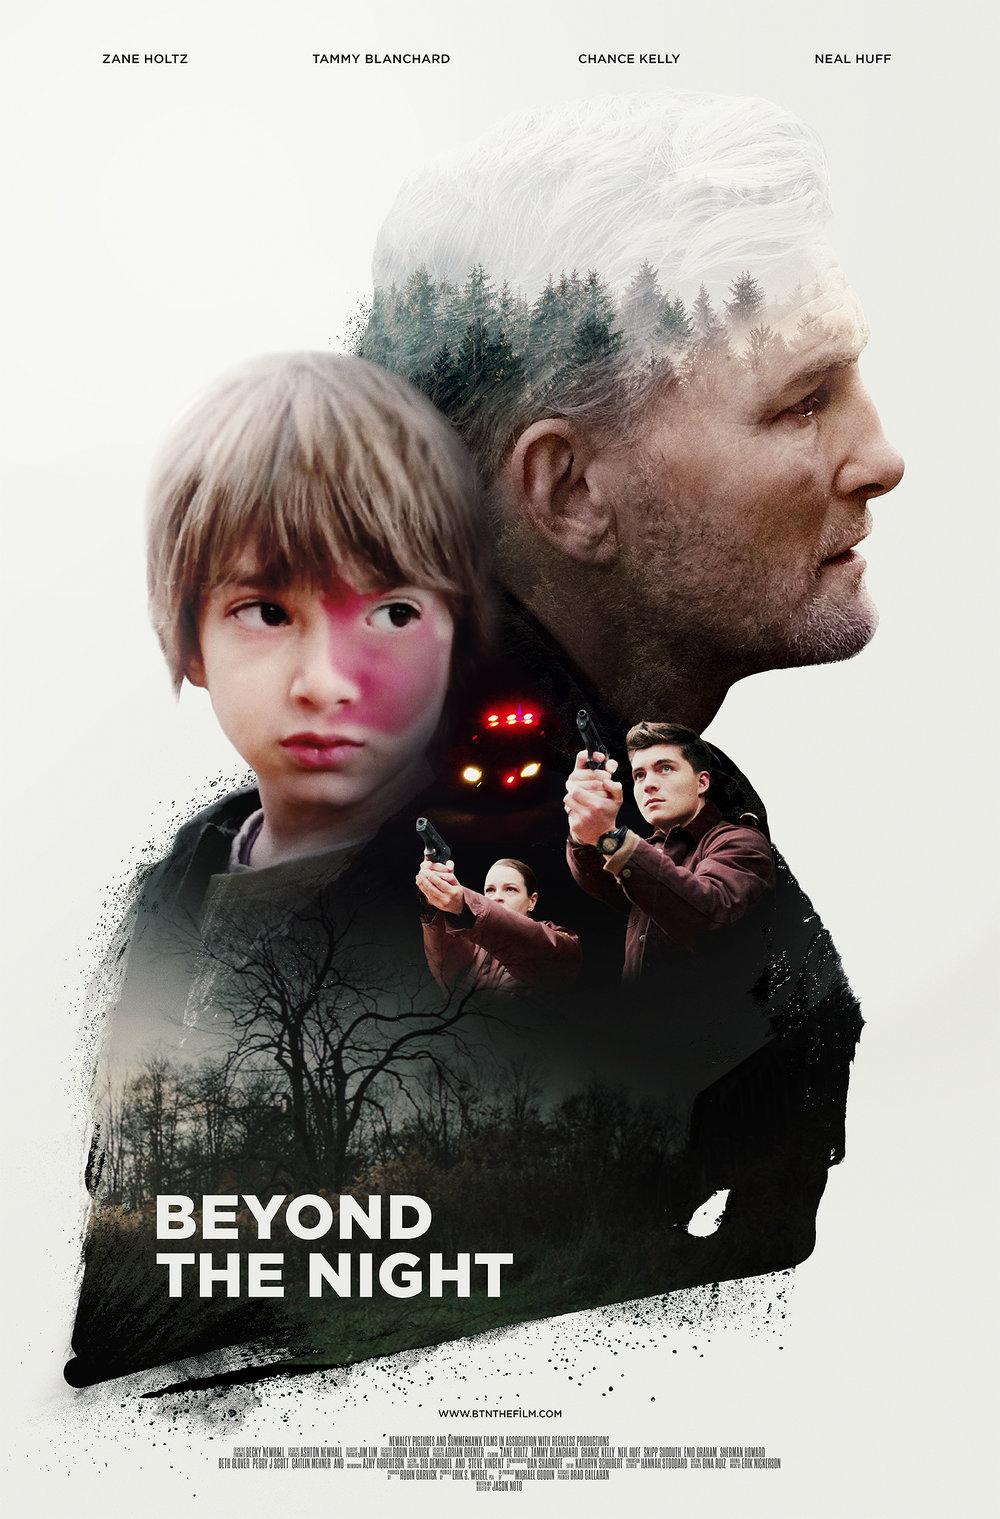 beyond_the_night_011_lowres.jpg